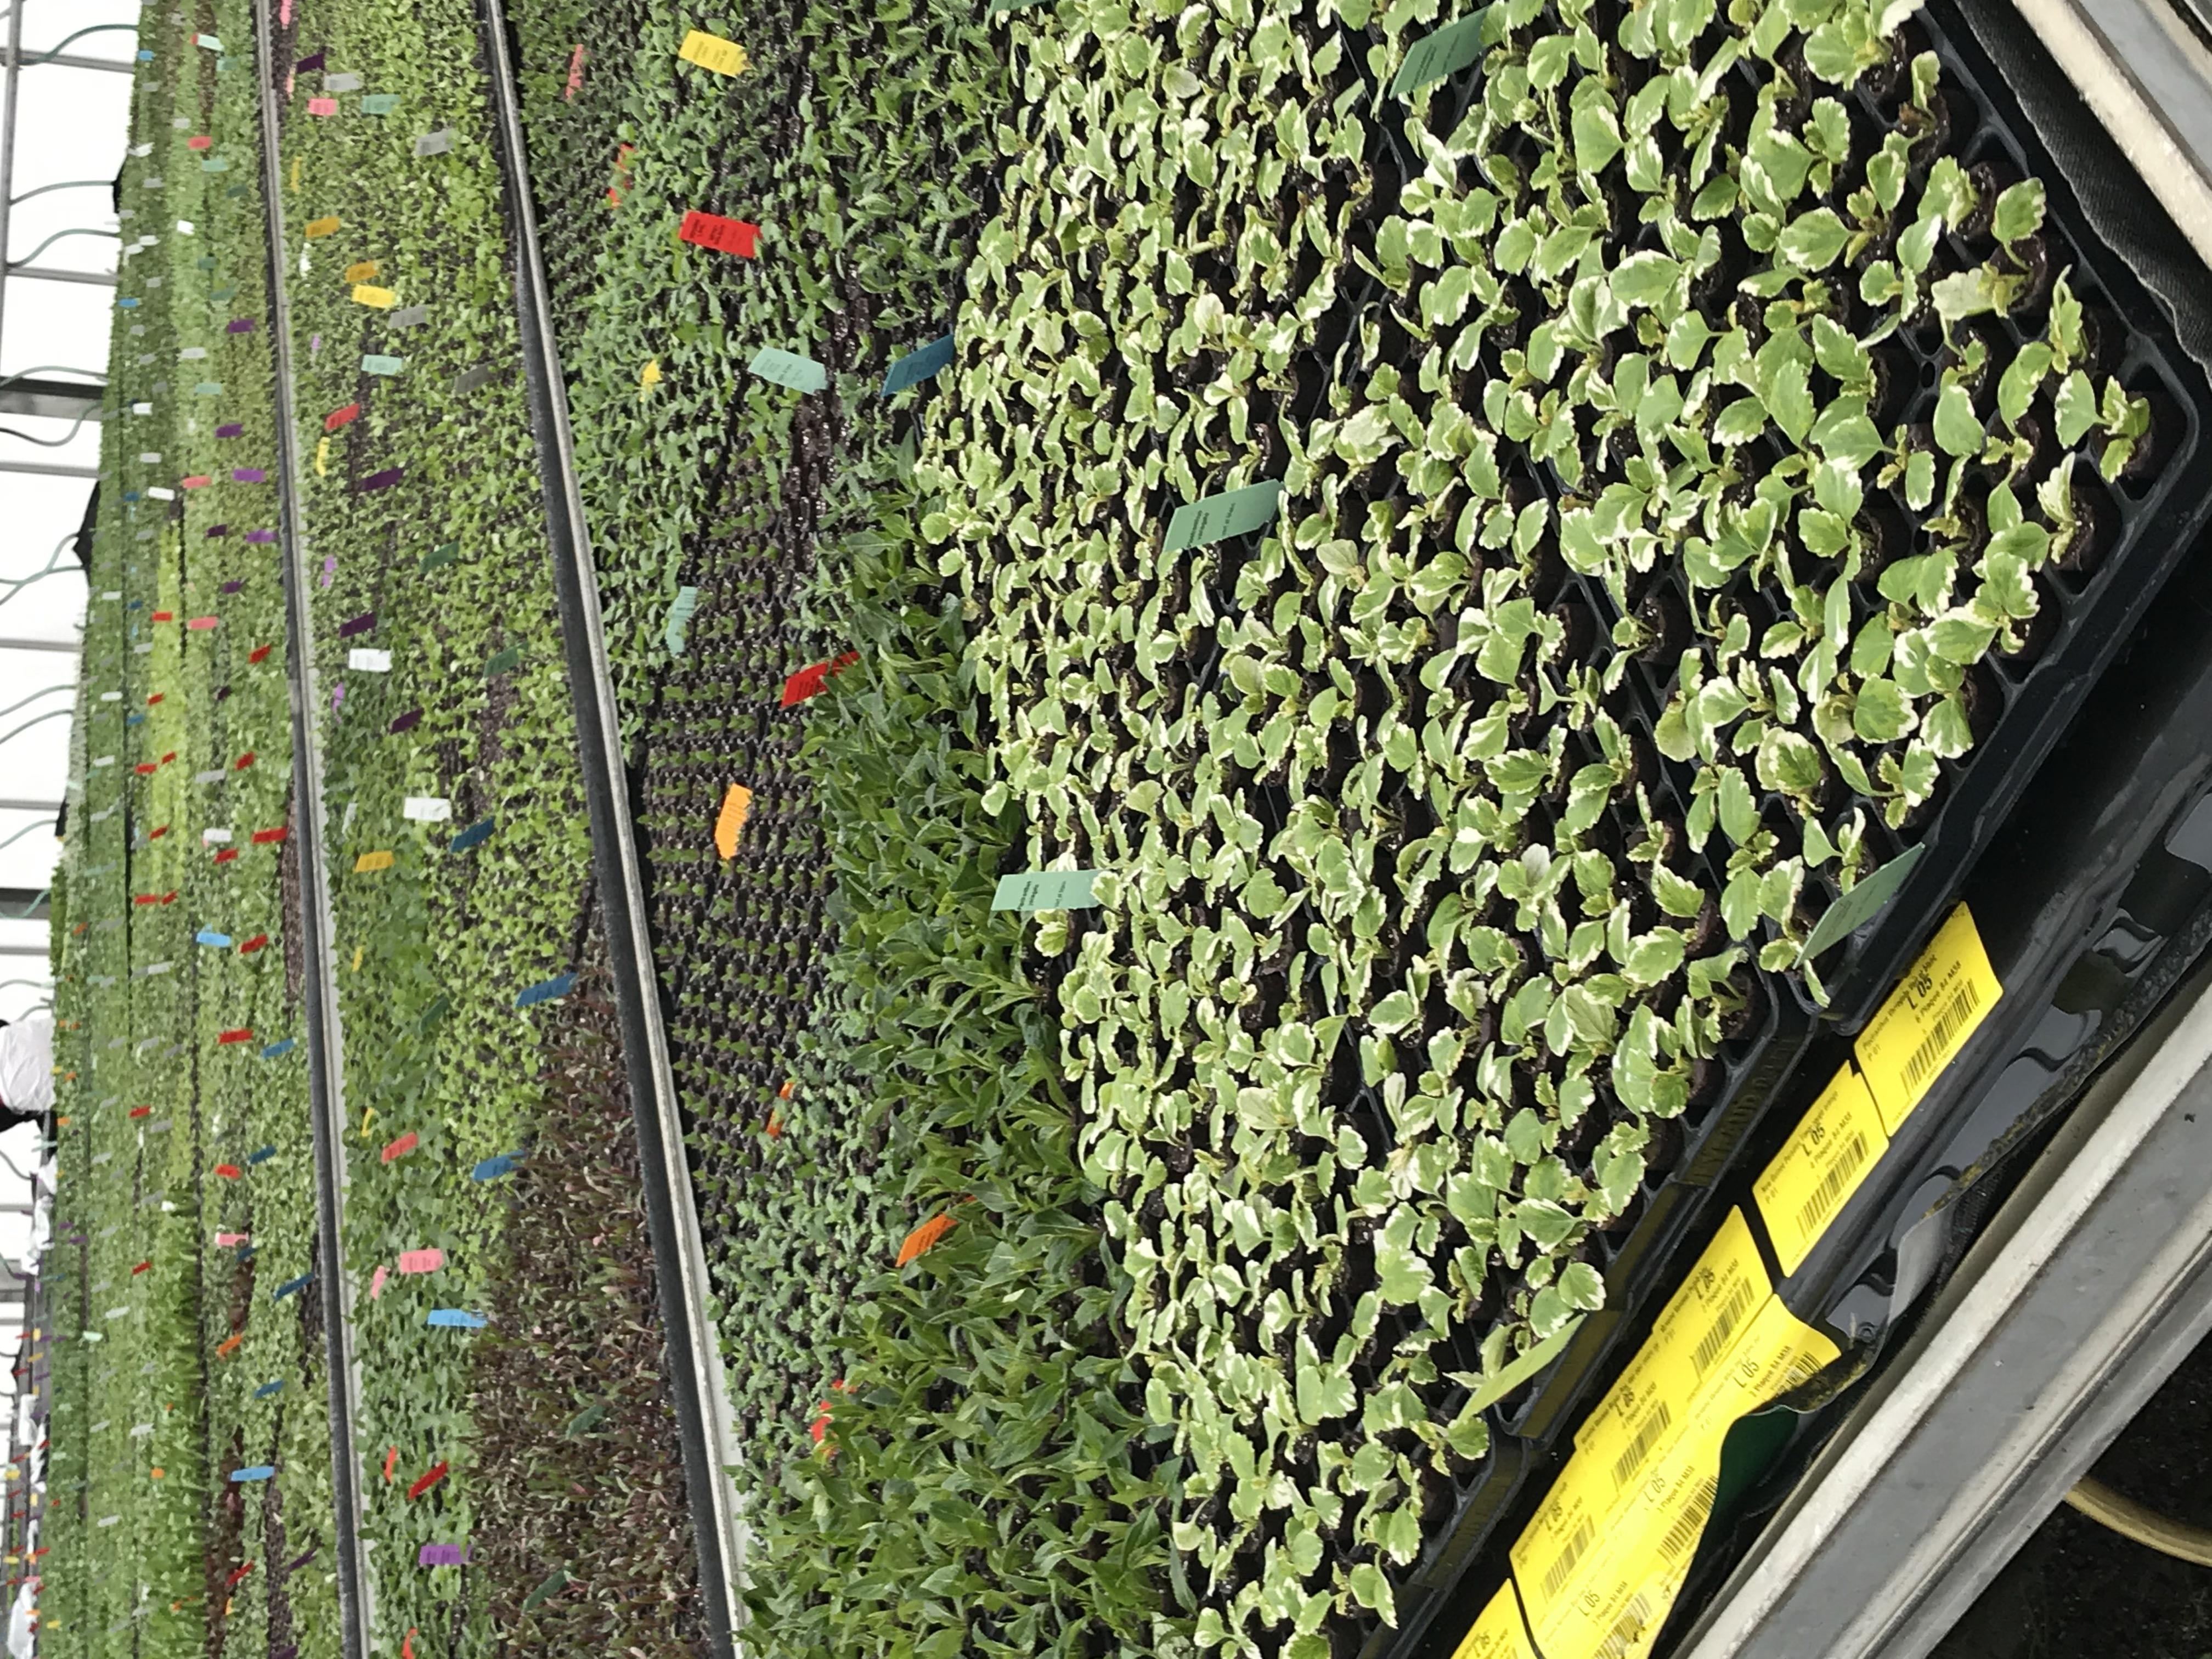 Plants de fleurs EYRAUD Productions Accompagnement expertise RH Conseil RH